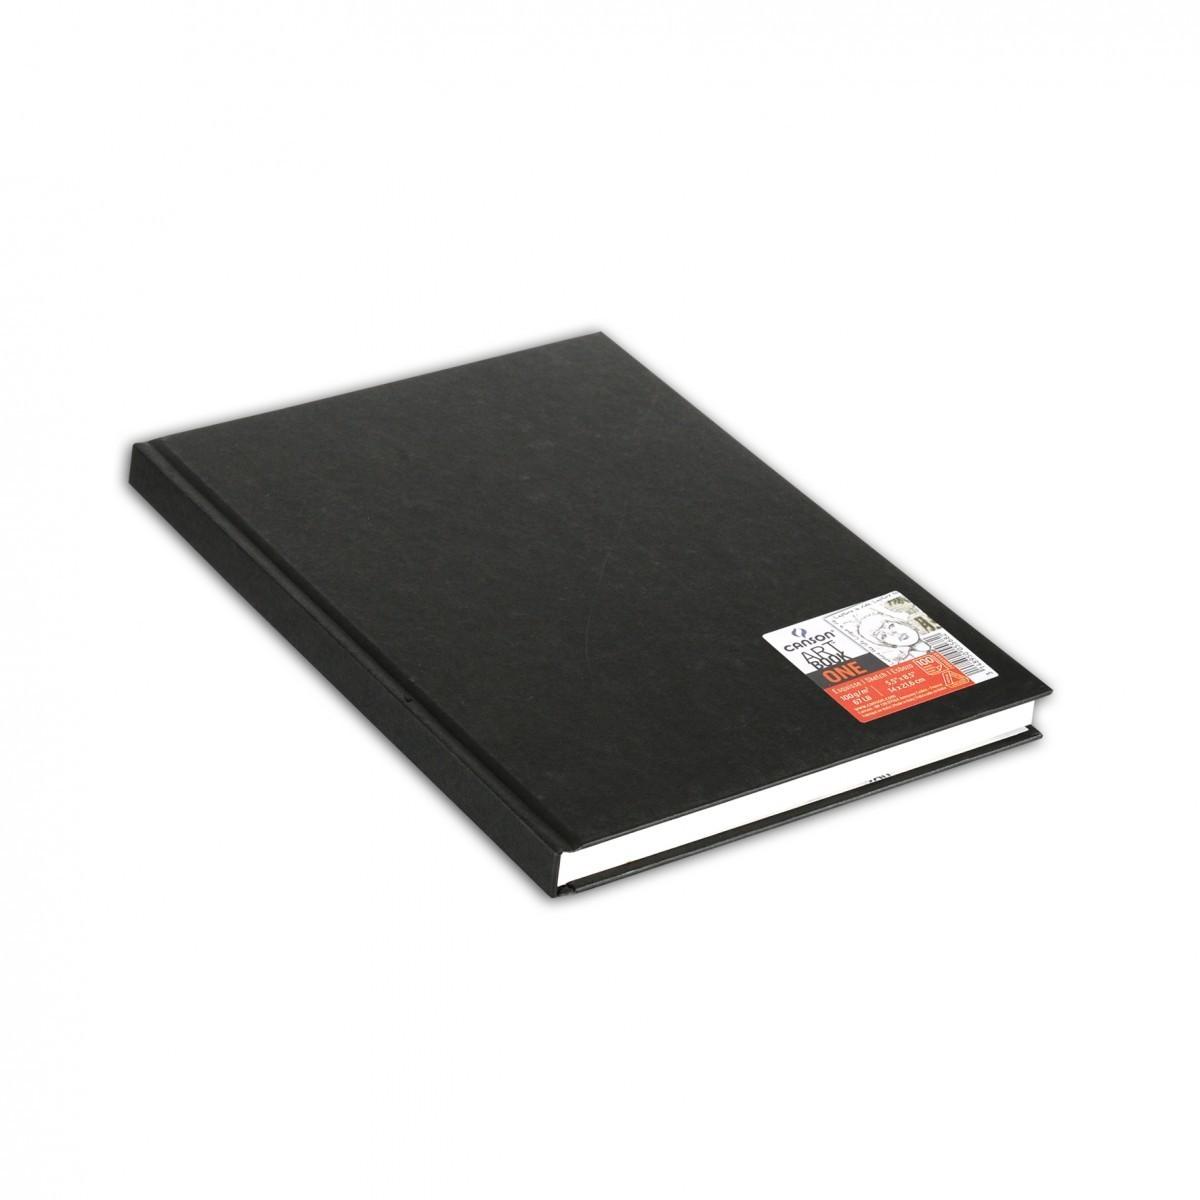 Caiet de schite Canson Art Book A5